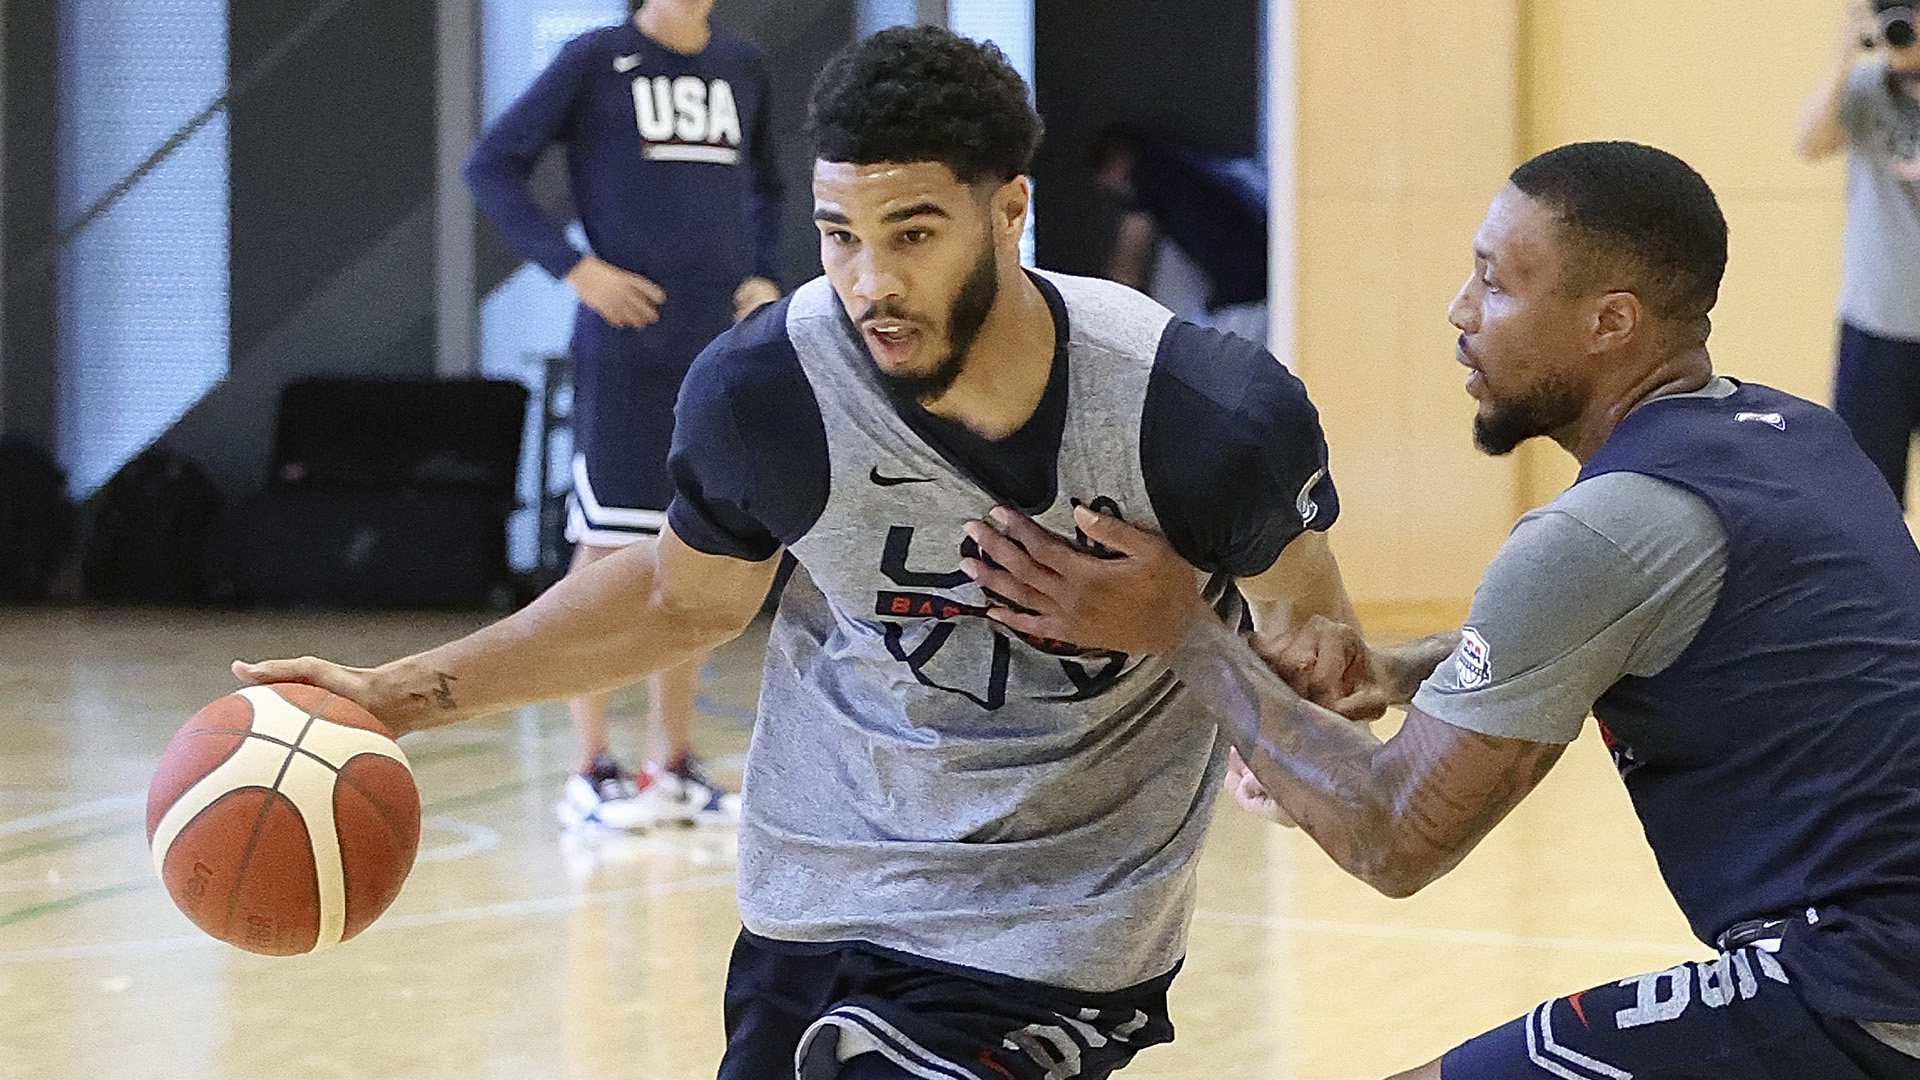 Team USA eyes quarterfinals ahead of Saturday matchup